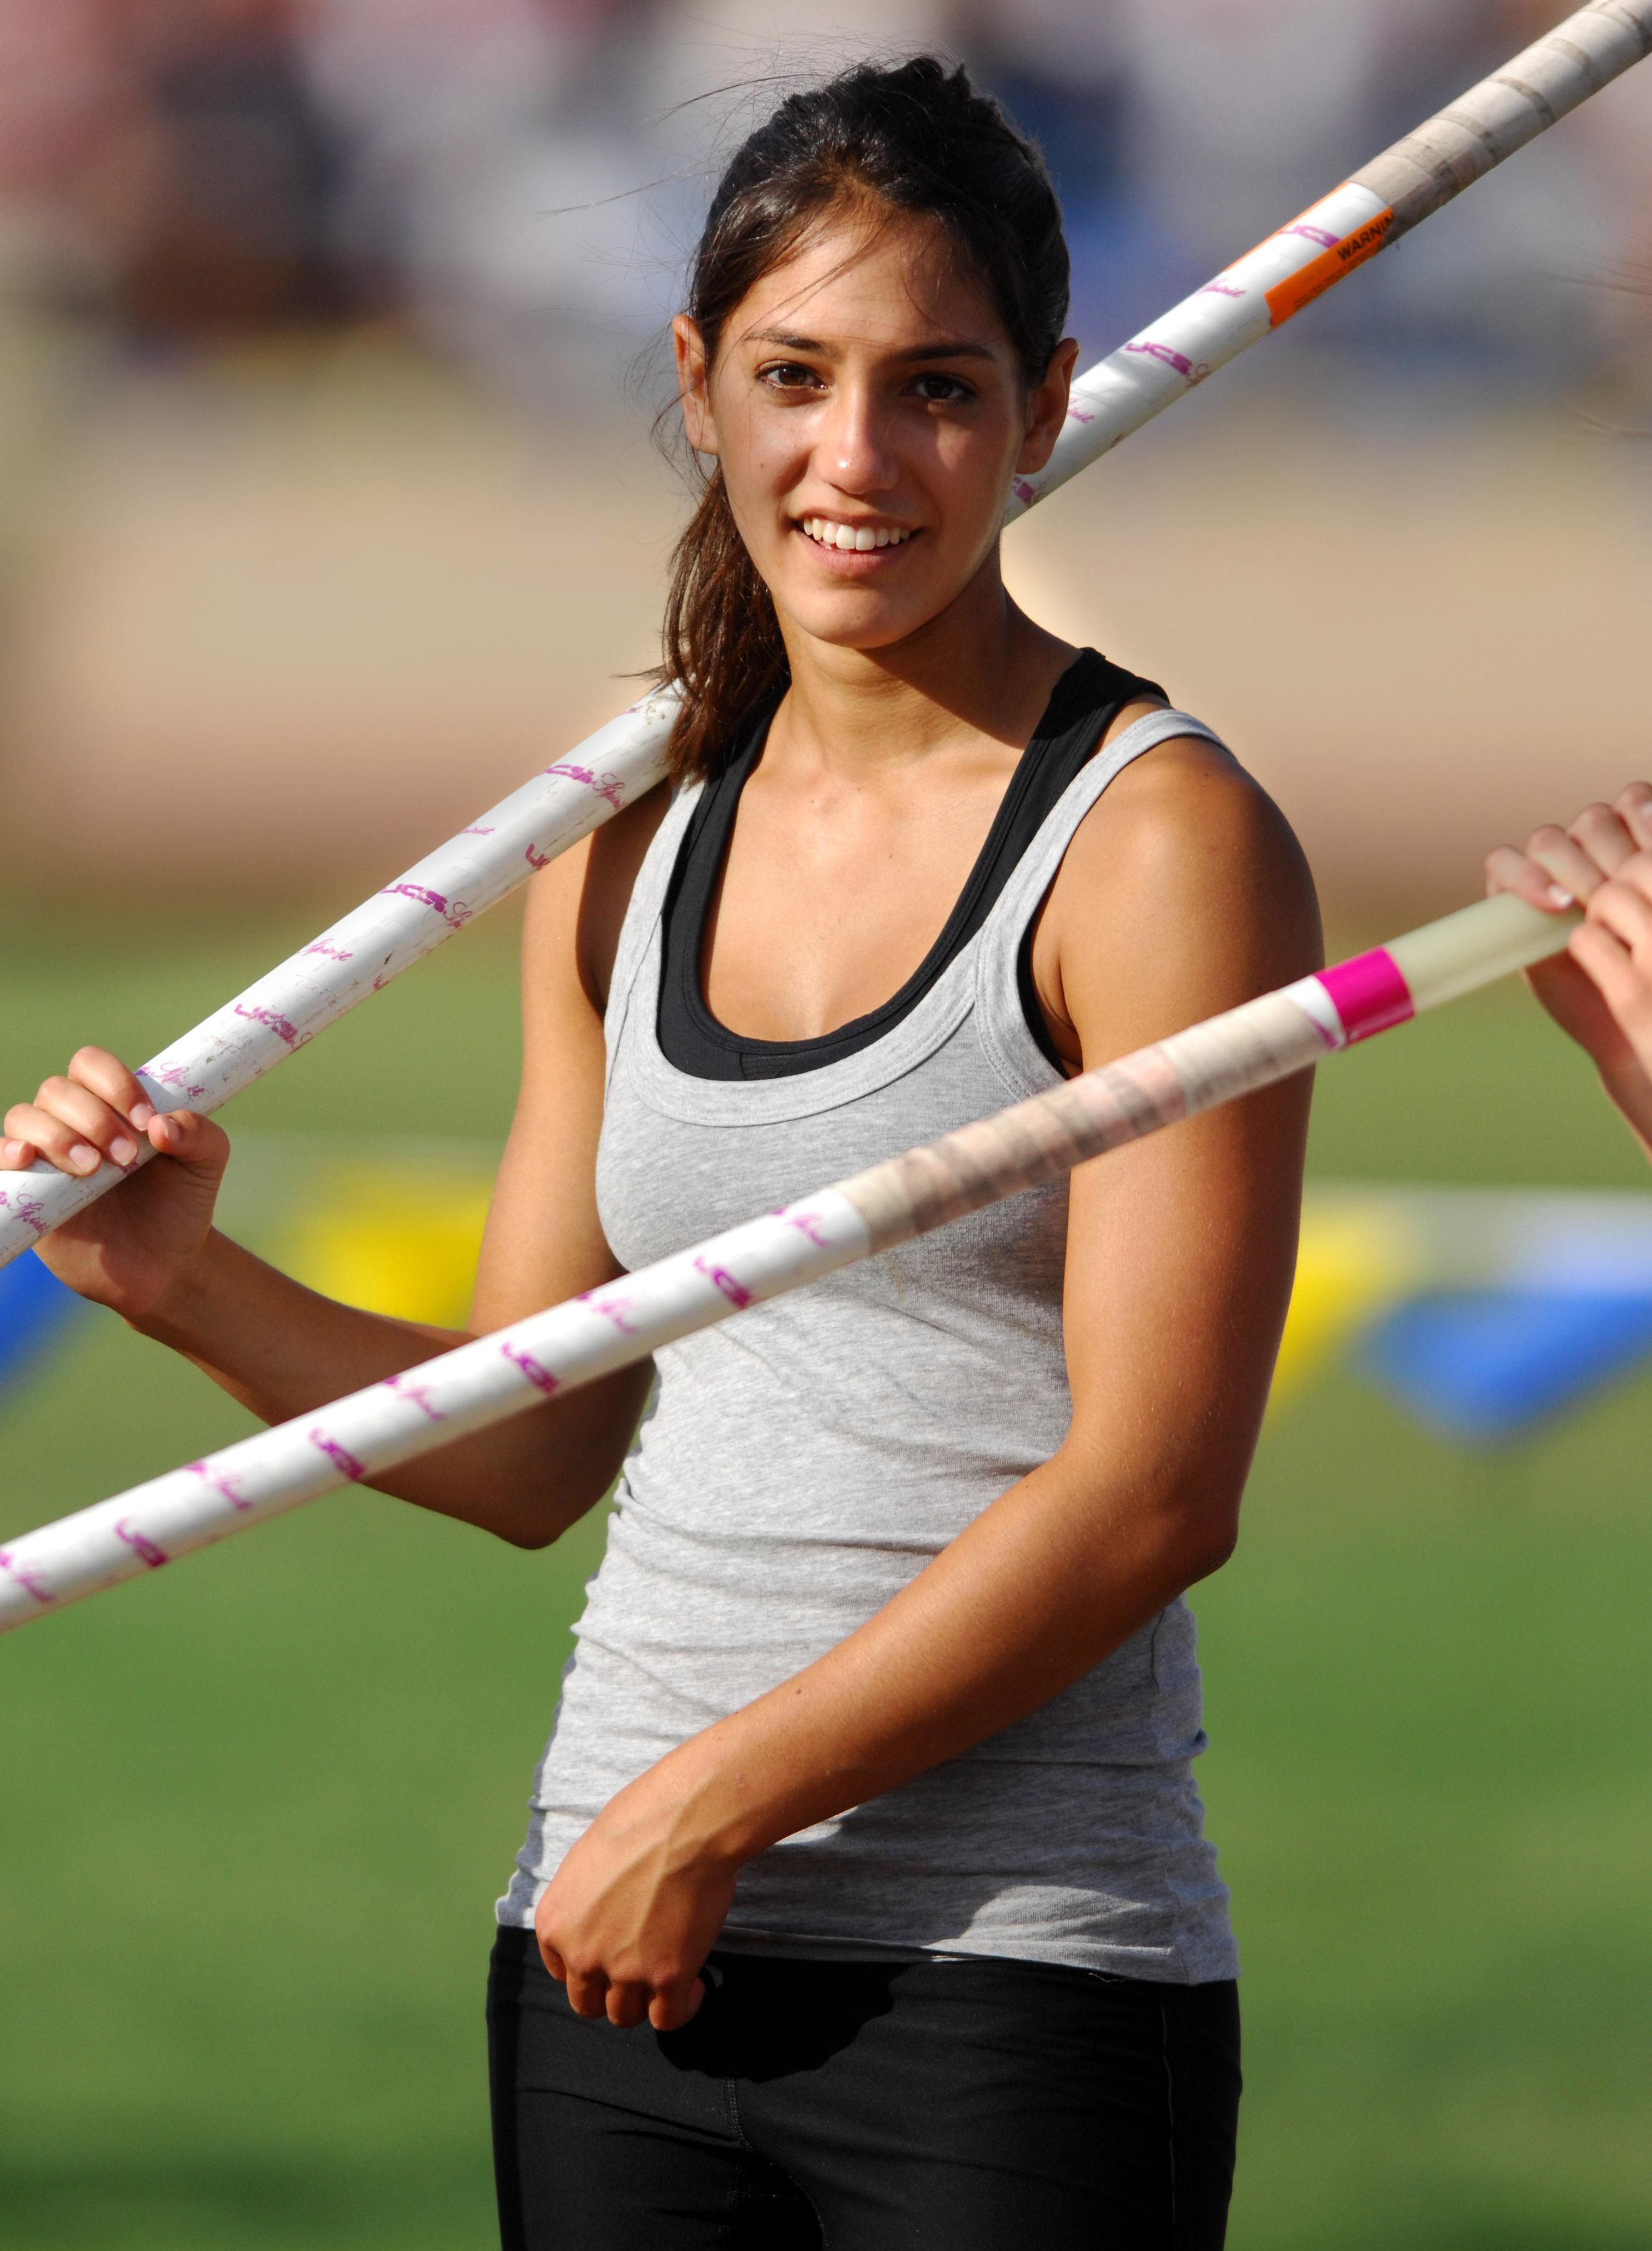 Allison Stokke is an athlete herself